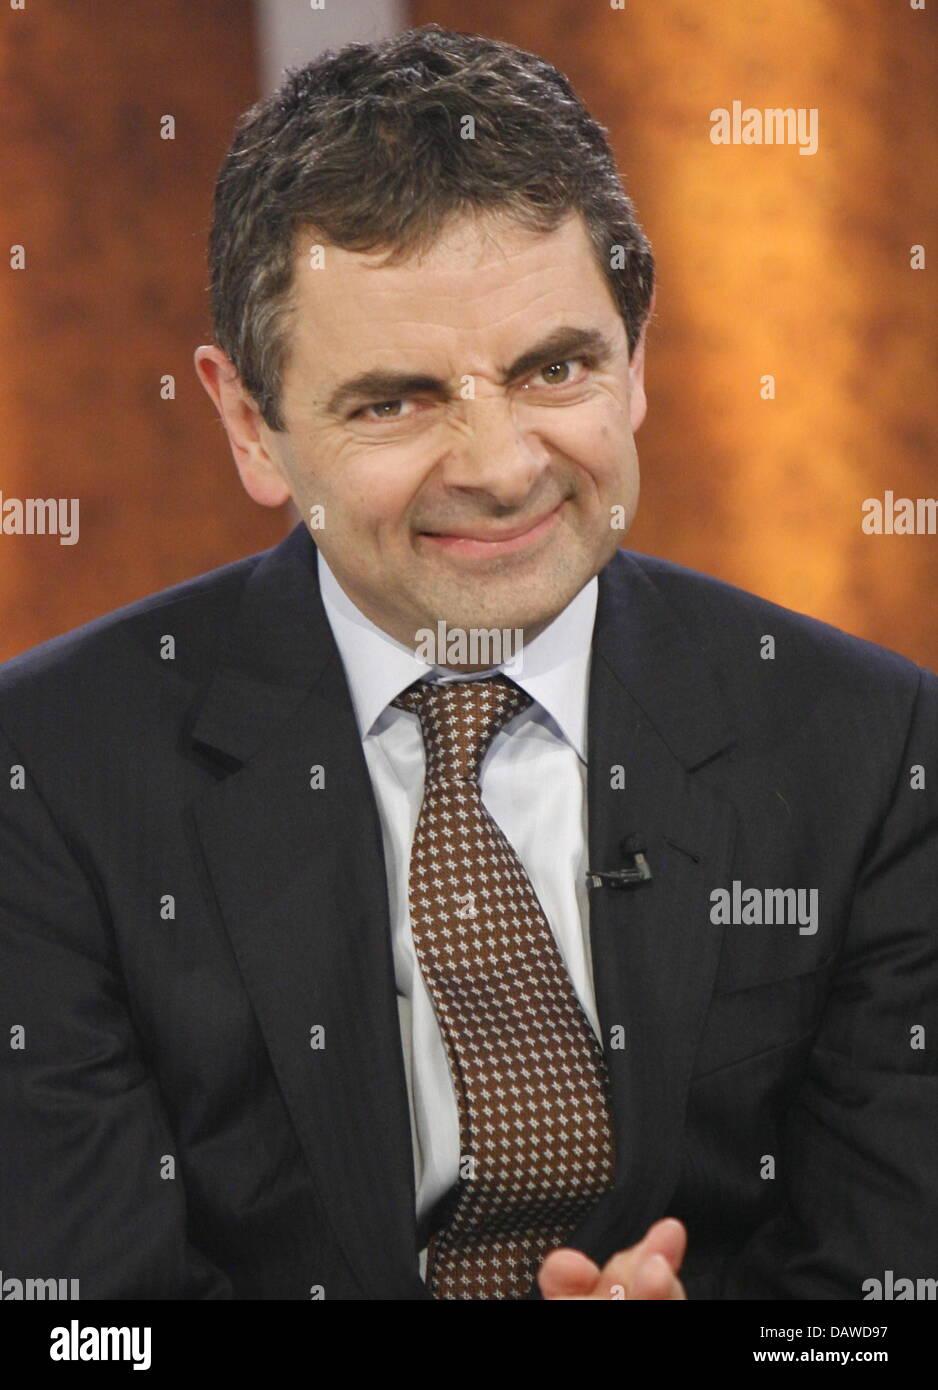 Mr Bean Schauspieler